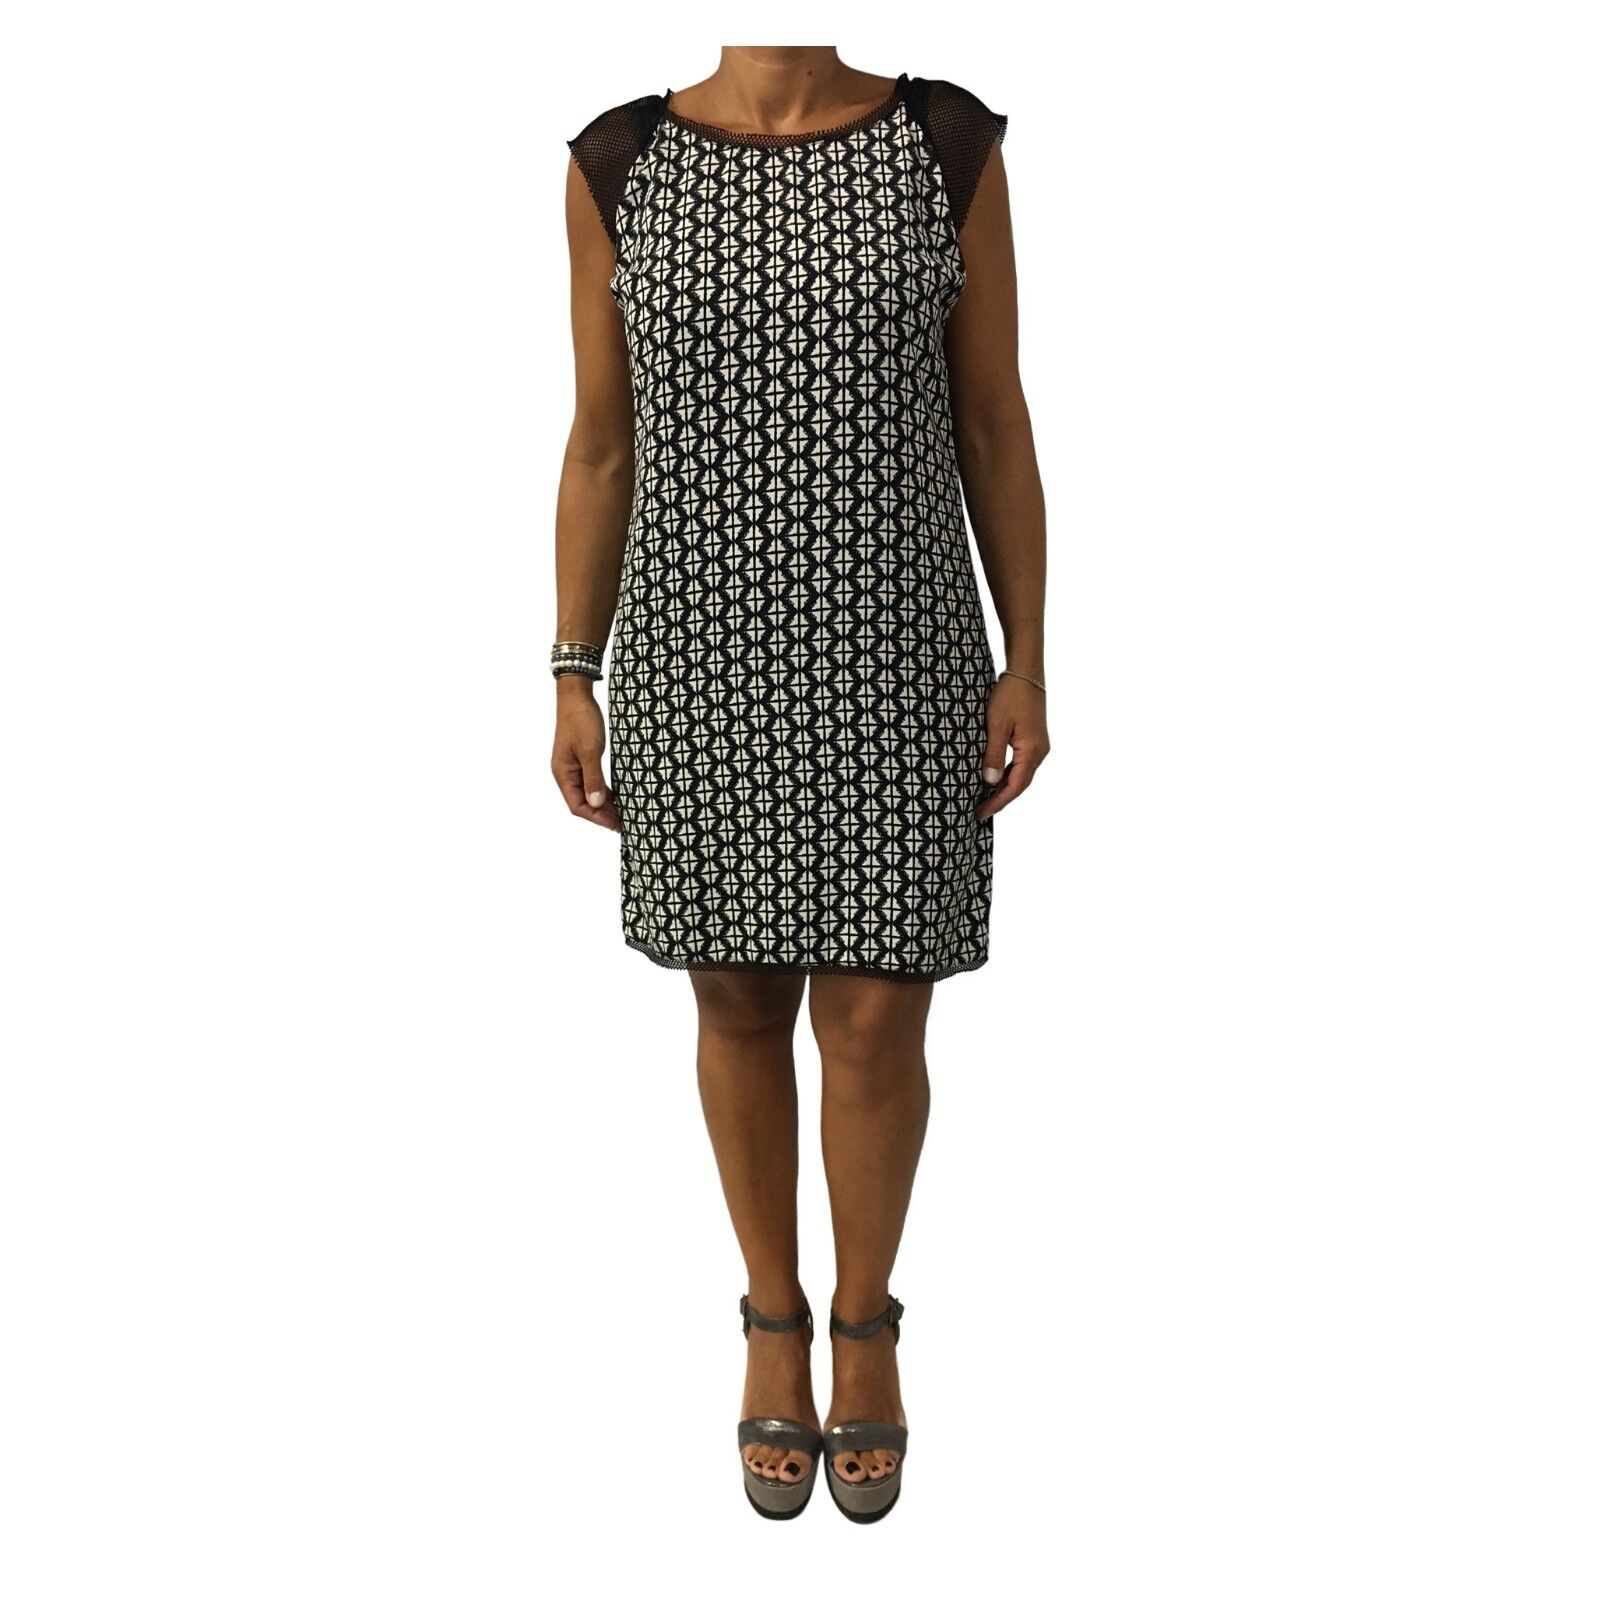 LA FEE MARABOUTEE Kleid Frau schwarz ecru 100%Polyester W7018 MADE IN ITALY it